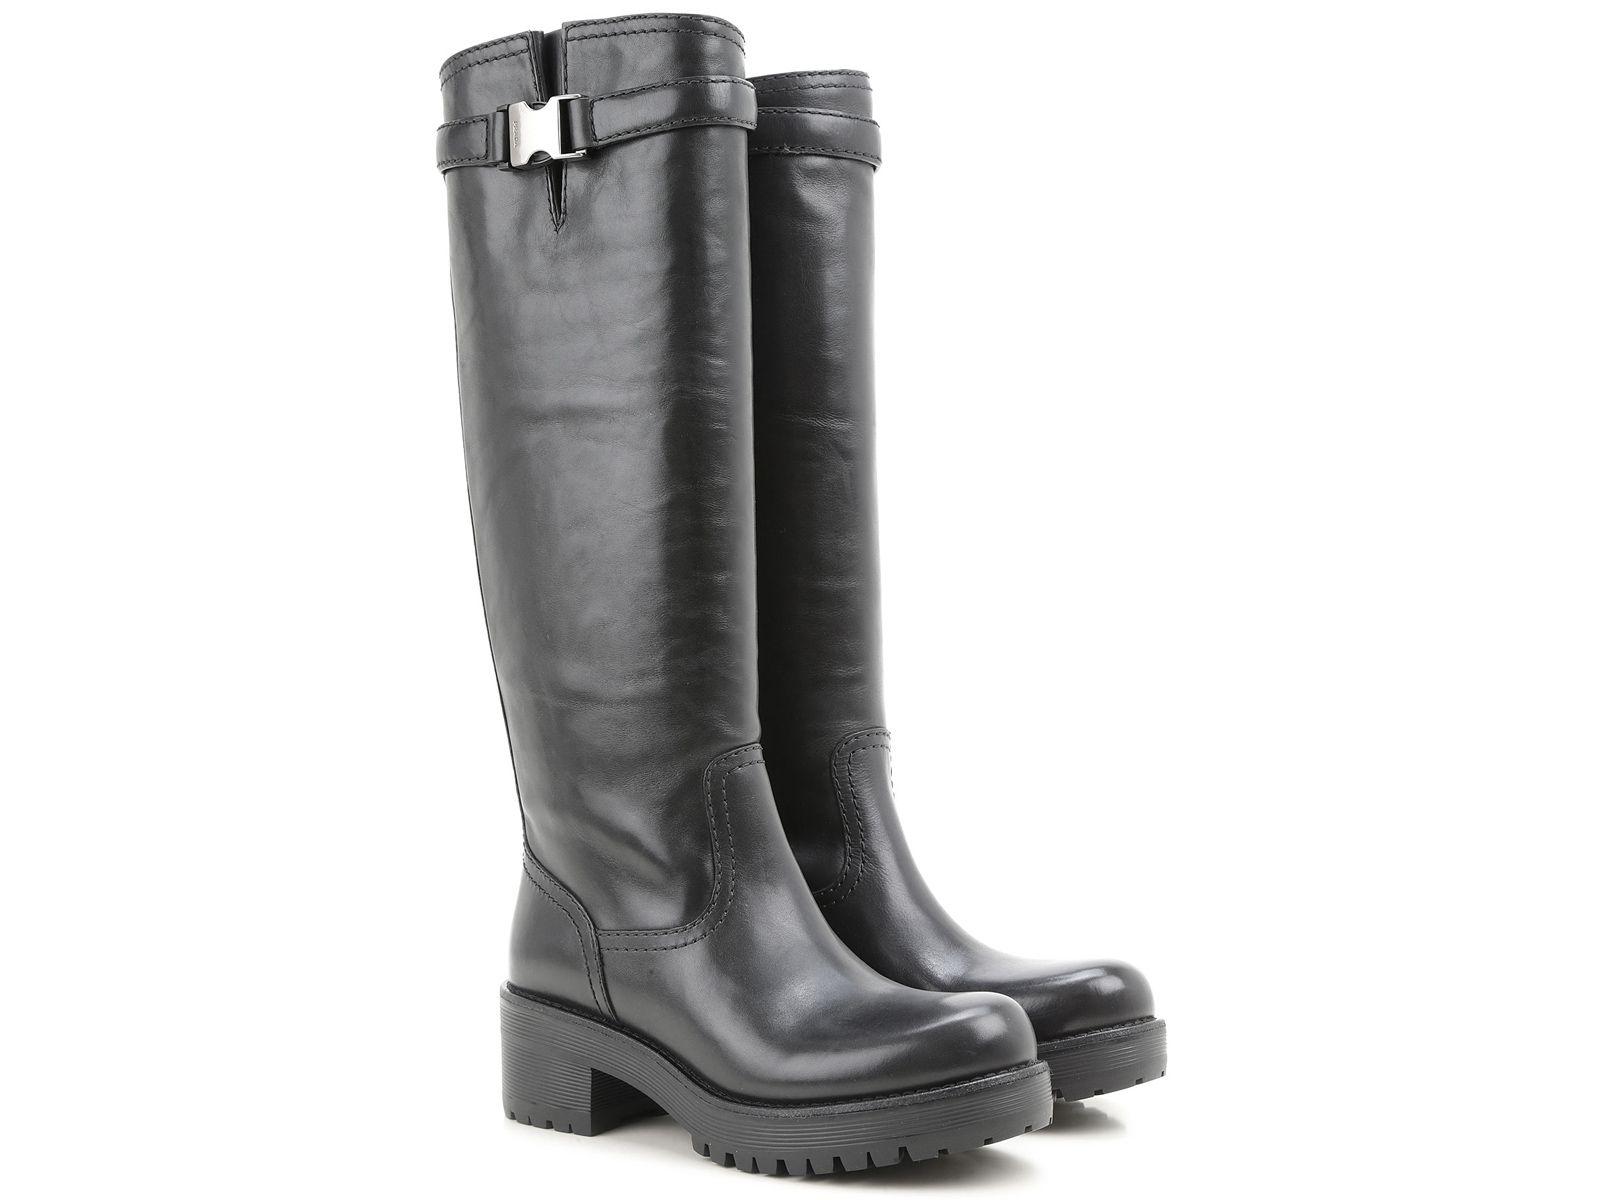 Prada knee high biker boots in black Calf leather - Italian Boutique €471 42acdcd5319